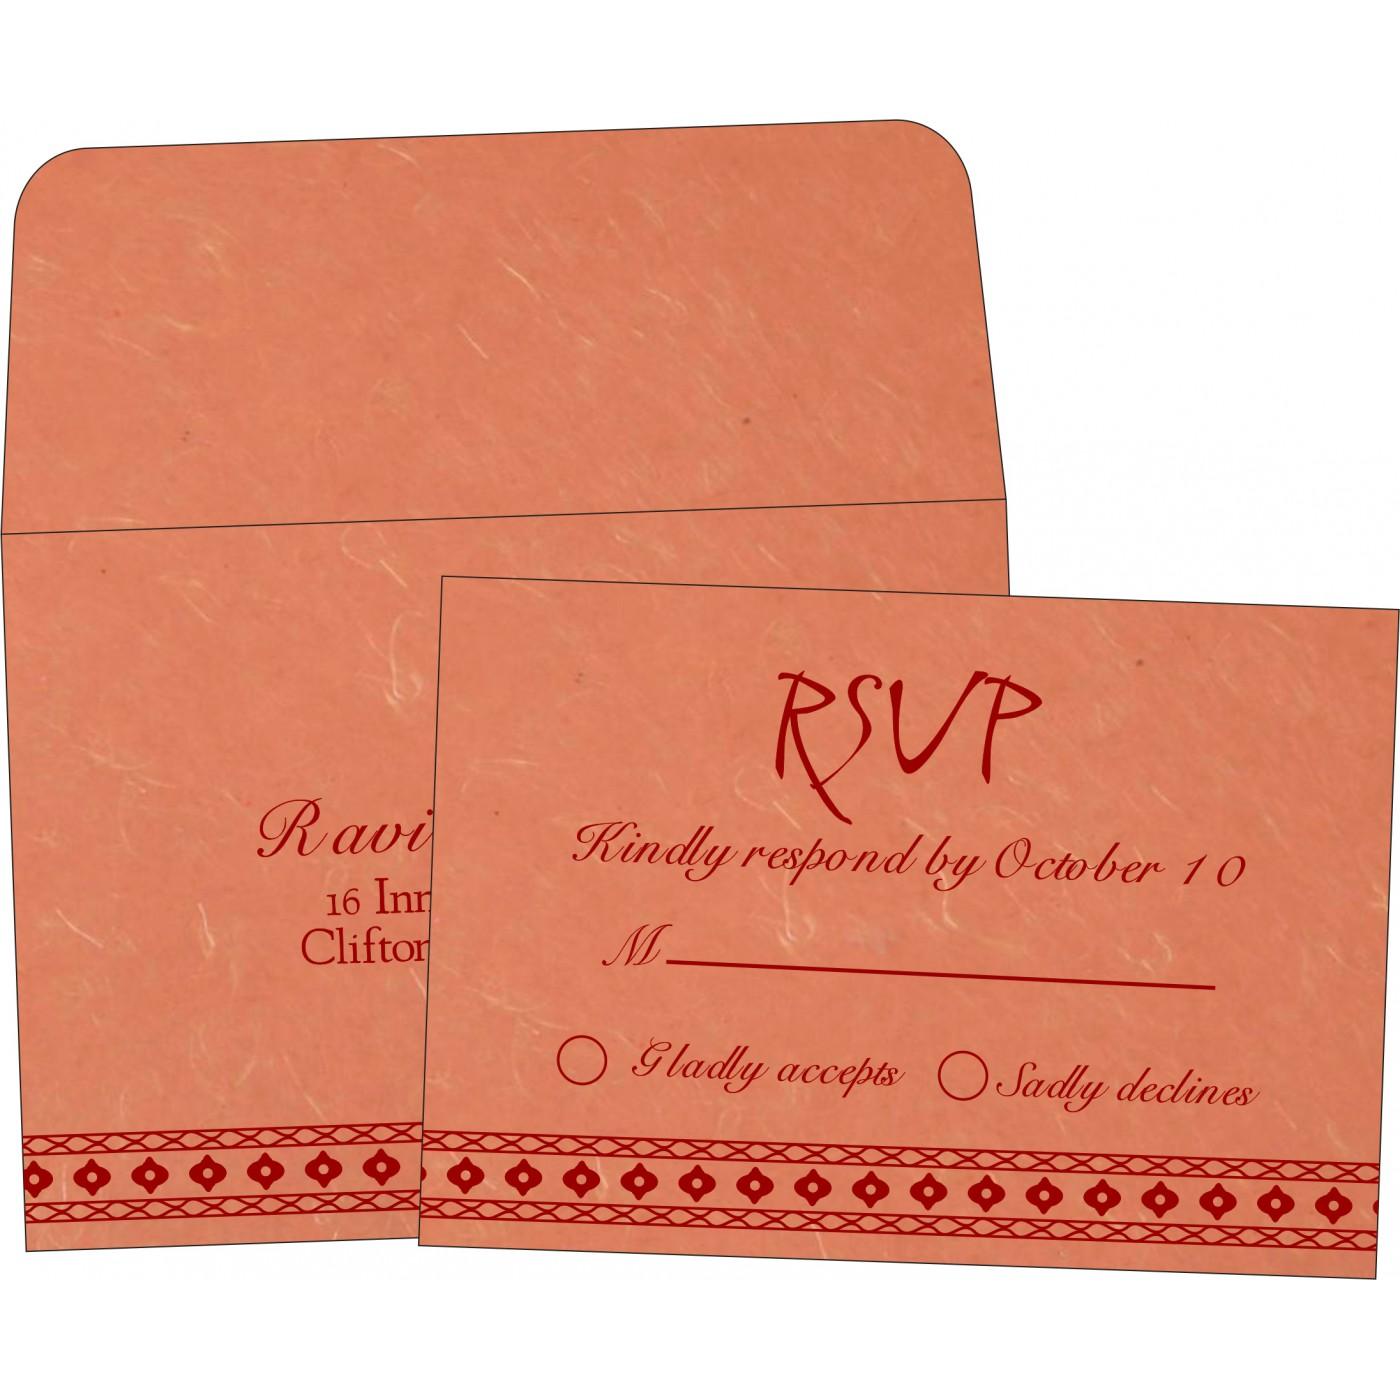 RSVP Cards : RSVP-5001M - 123WeddingCards